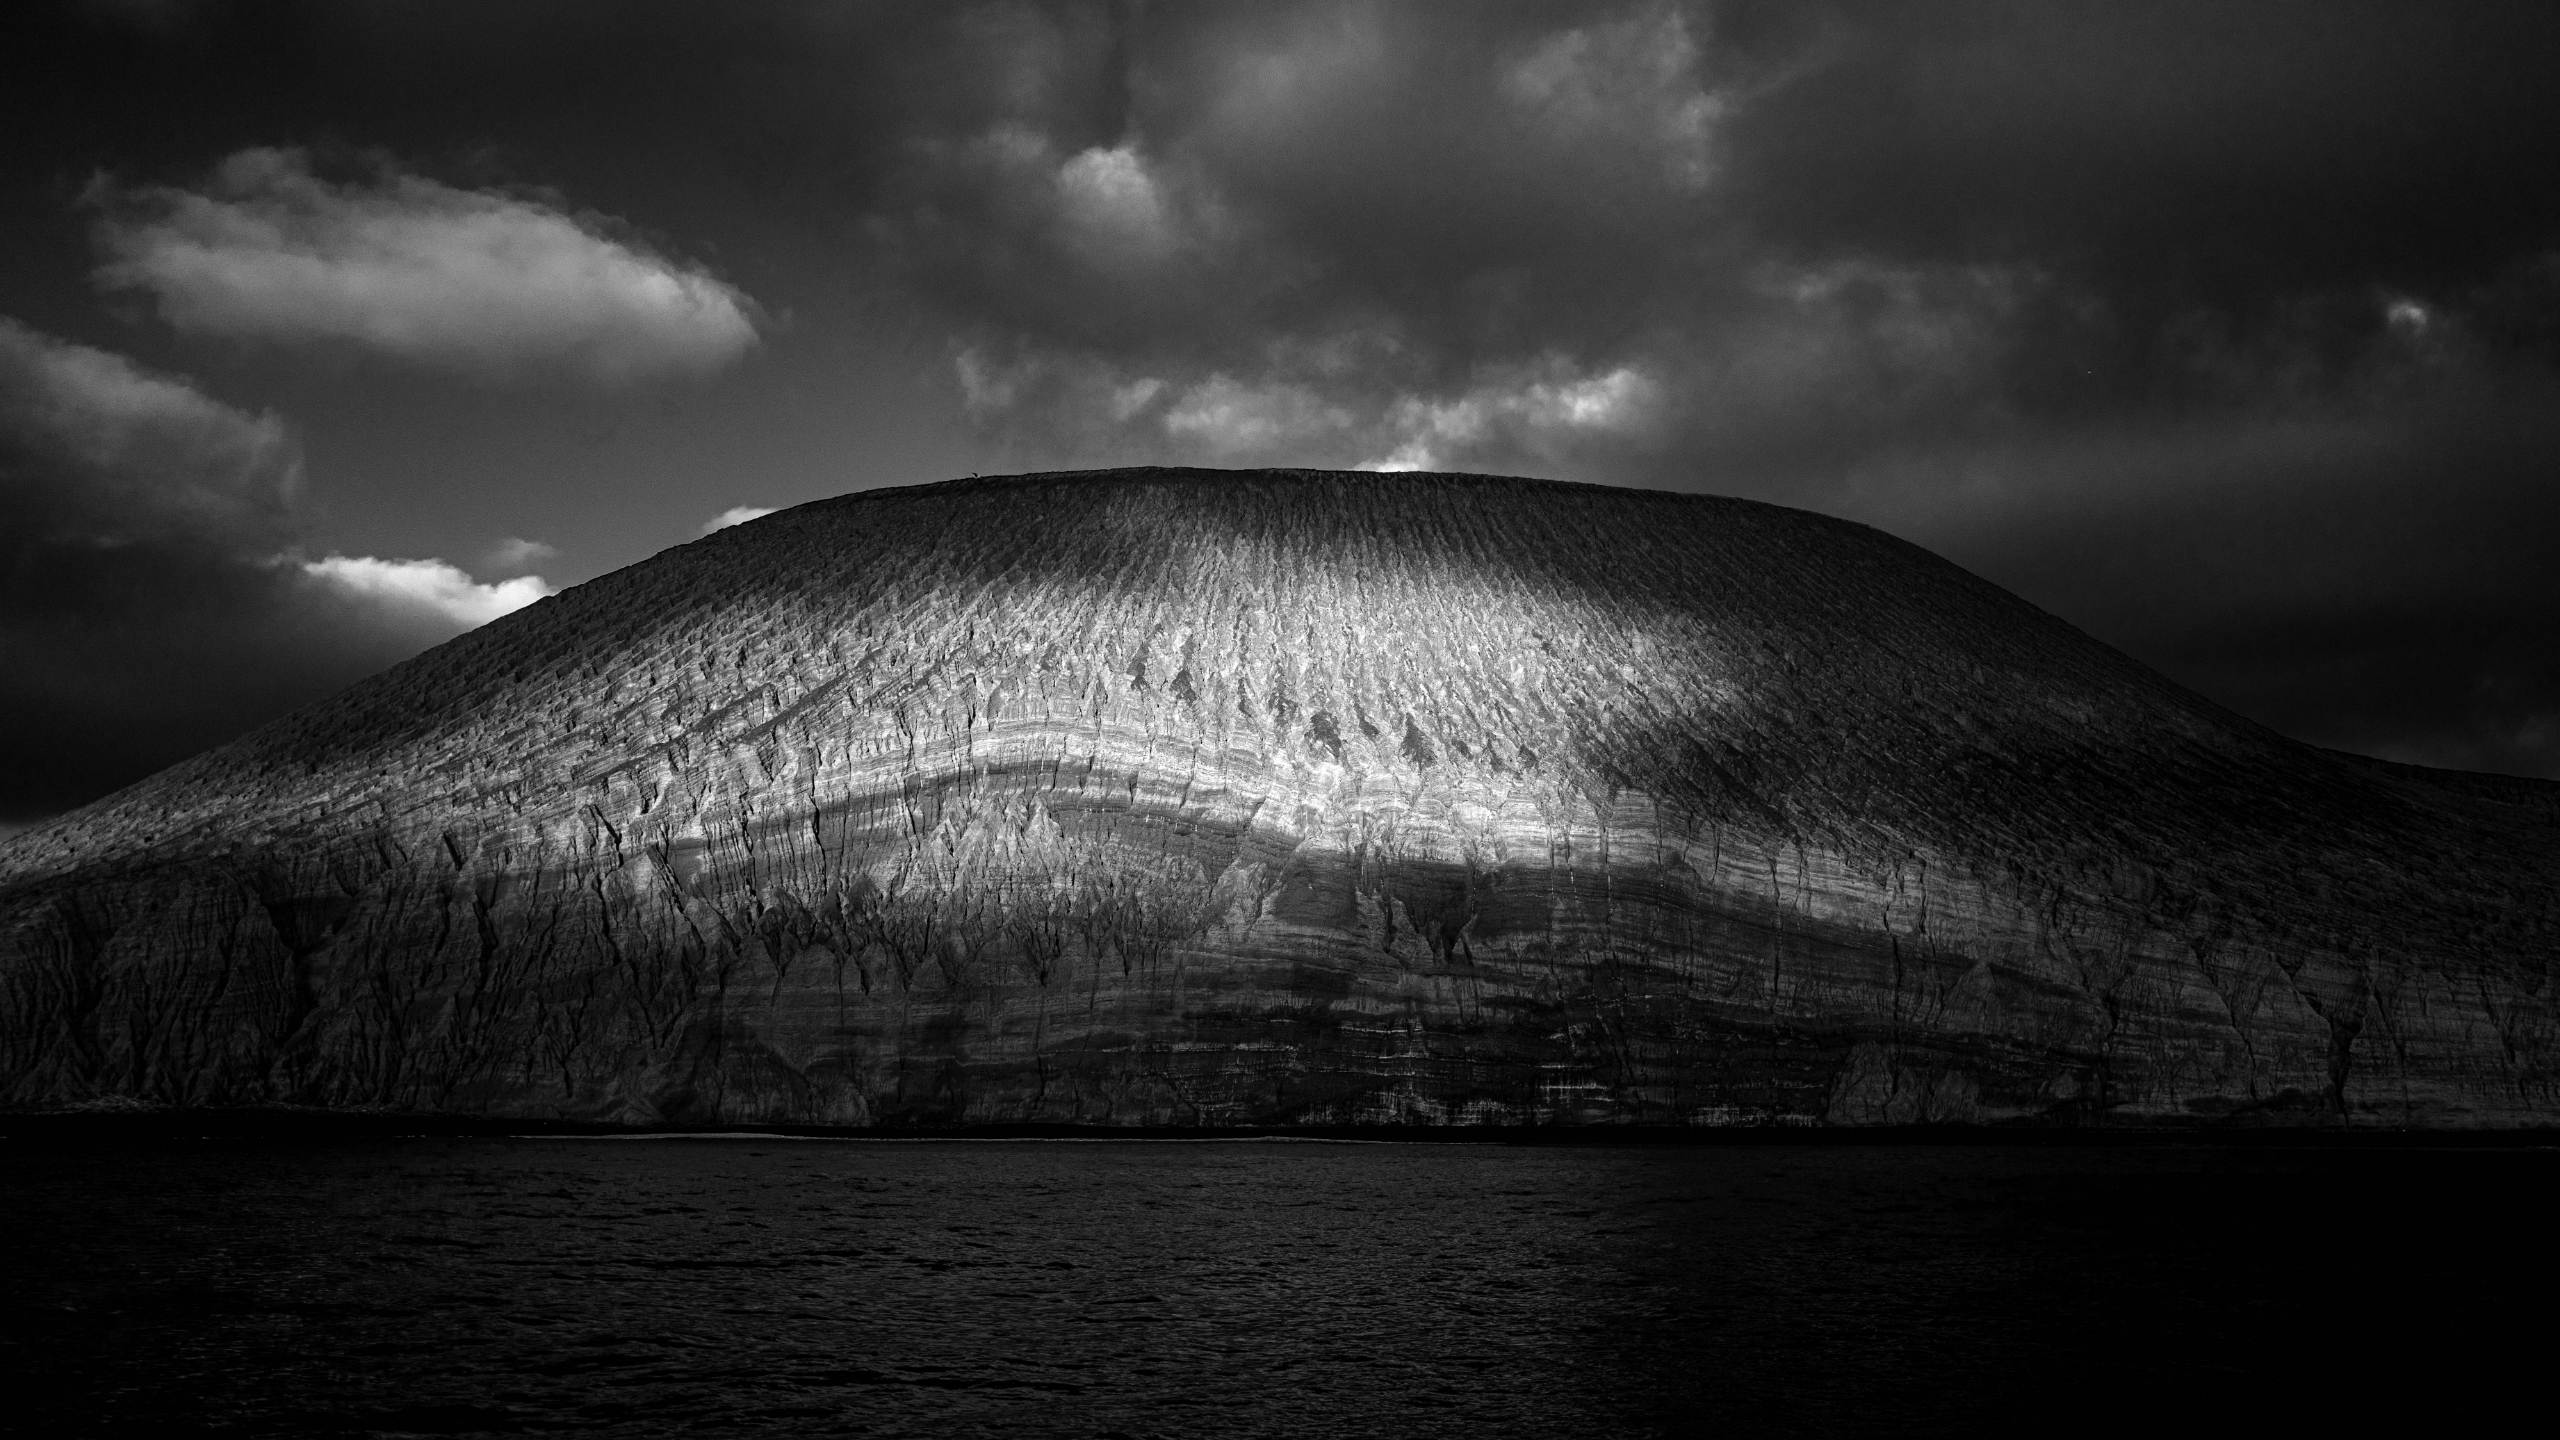 blackandwhite, landscape - ben-staley | ello